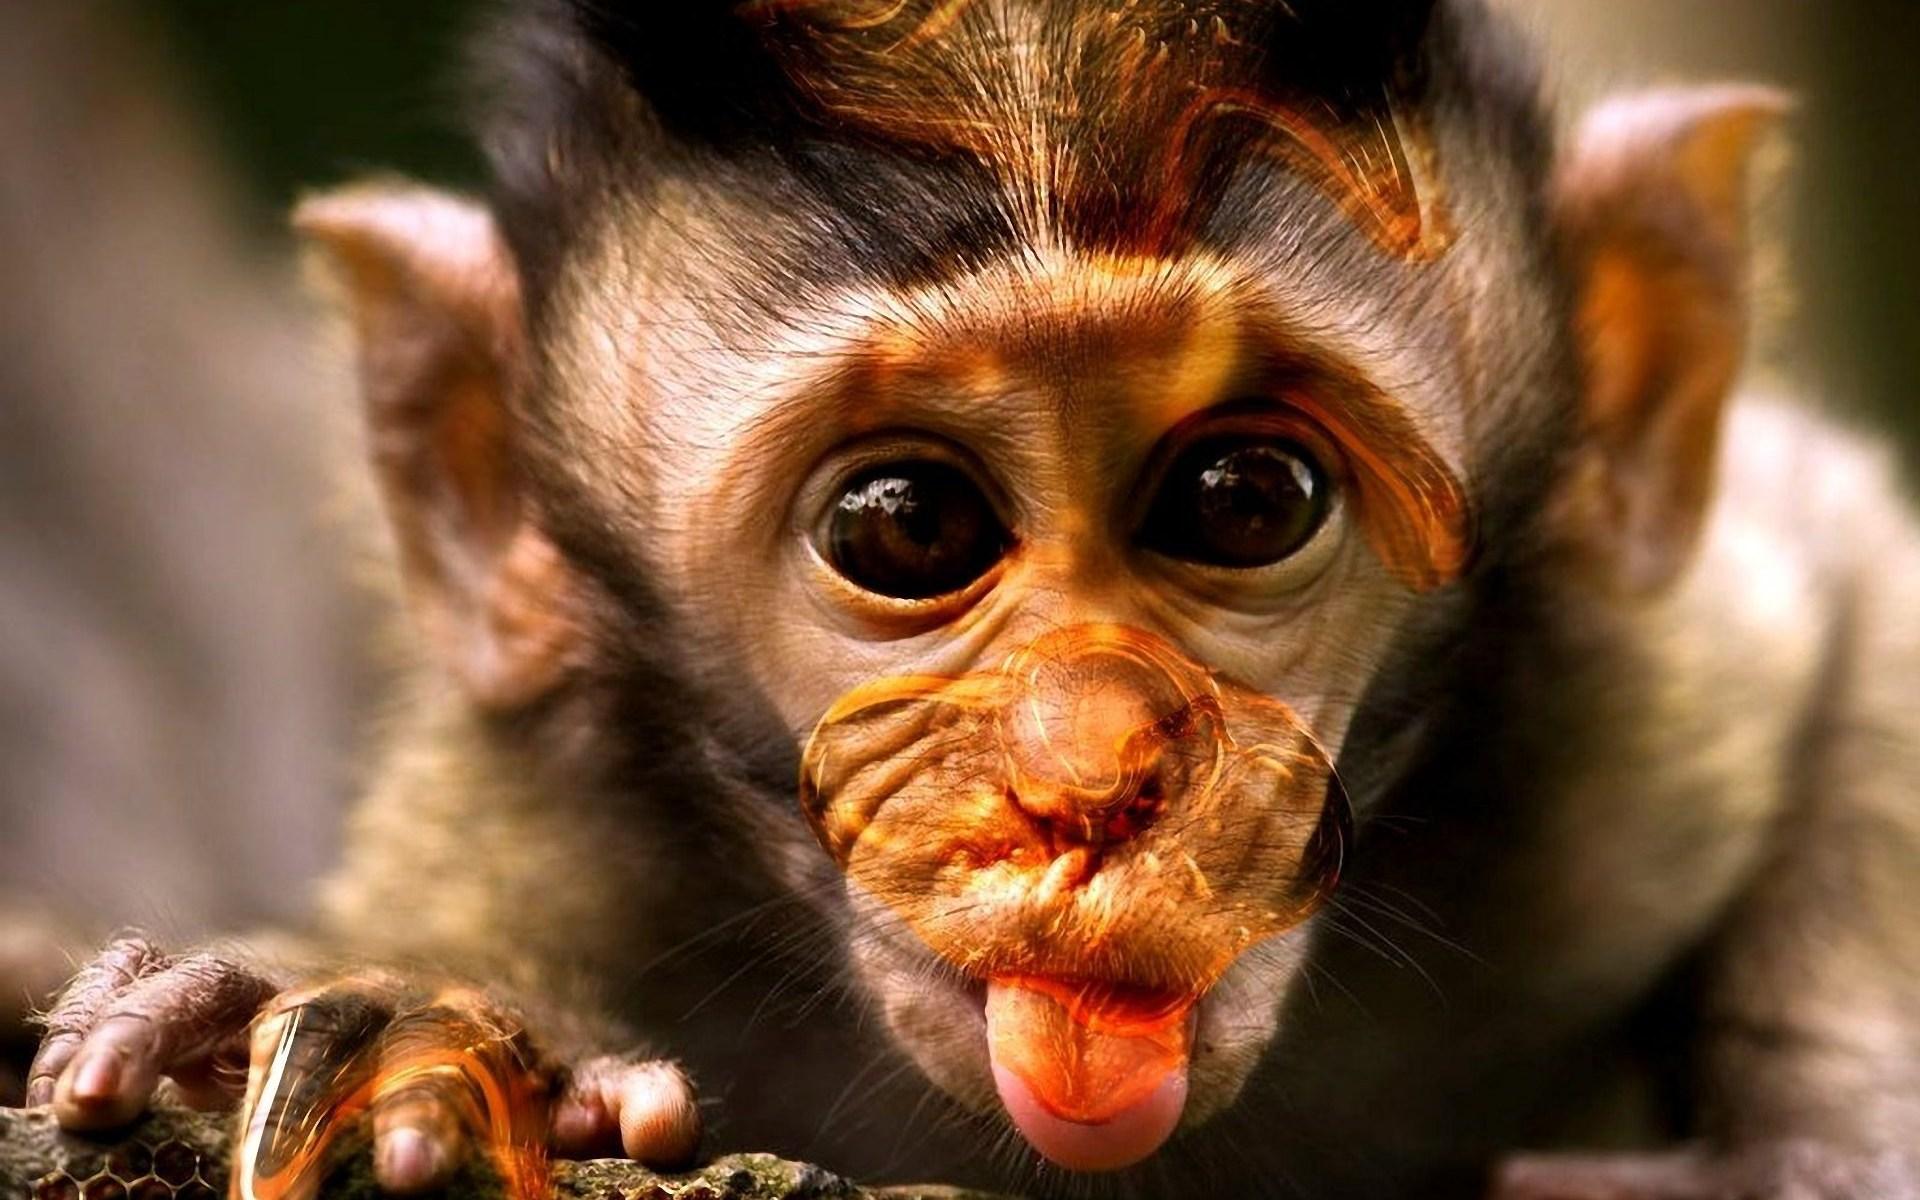 Monkey Wallpaper monkey wallpaper - wallpapersafari